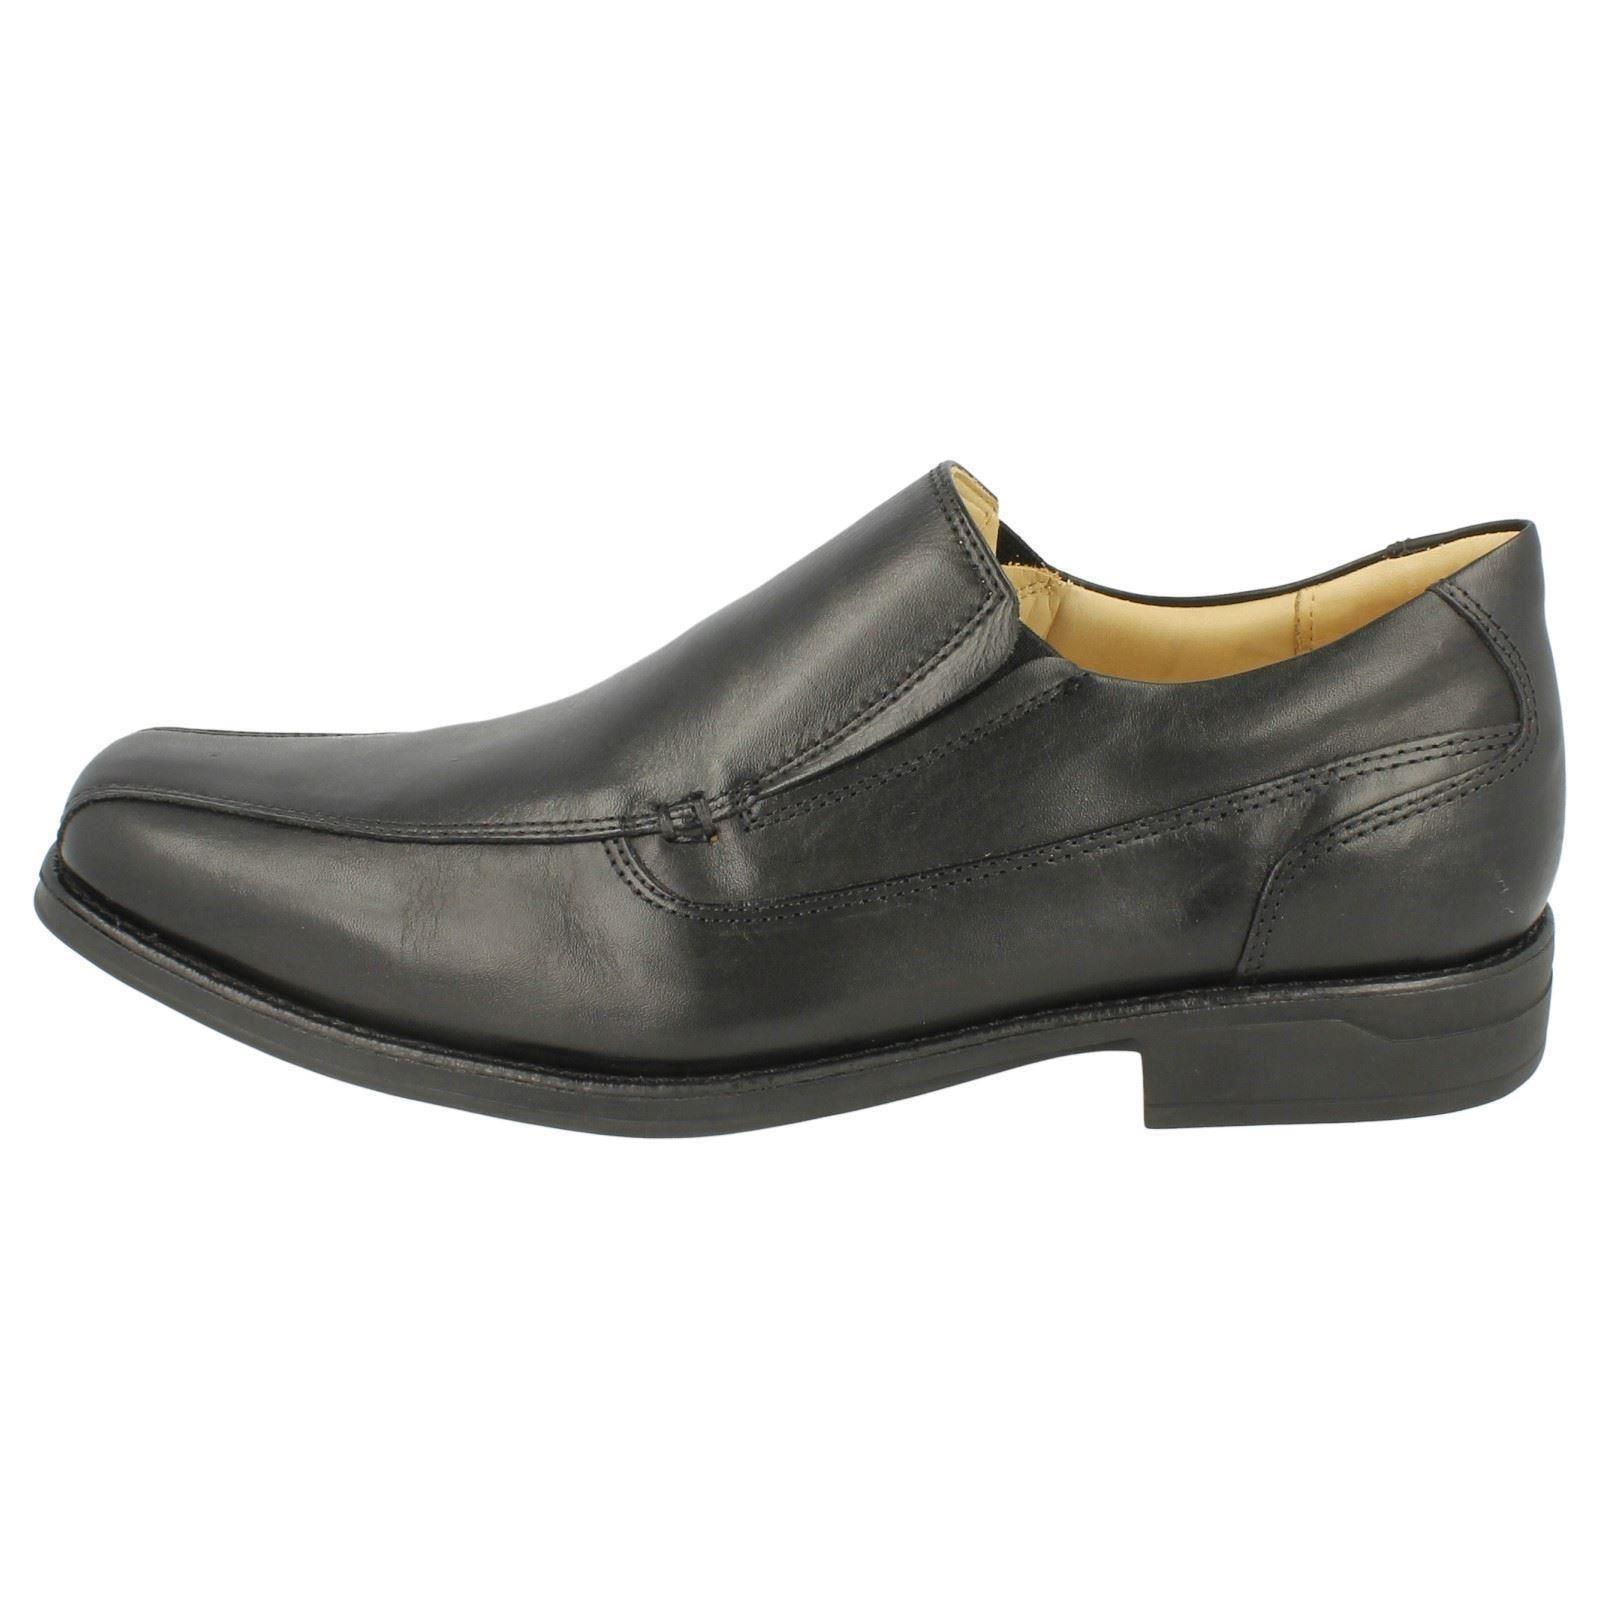 Mens Anatomic /& Co Slip On Shoes Poloni